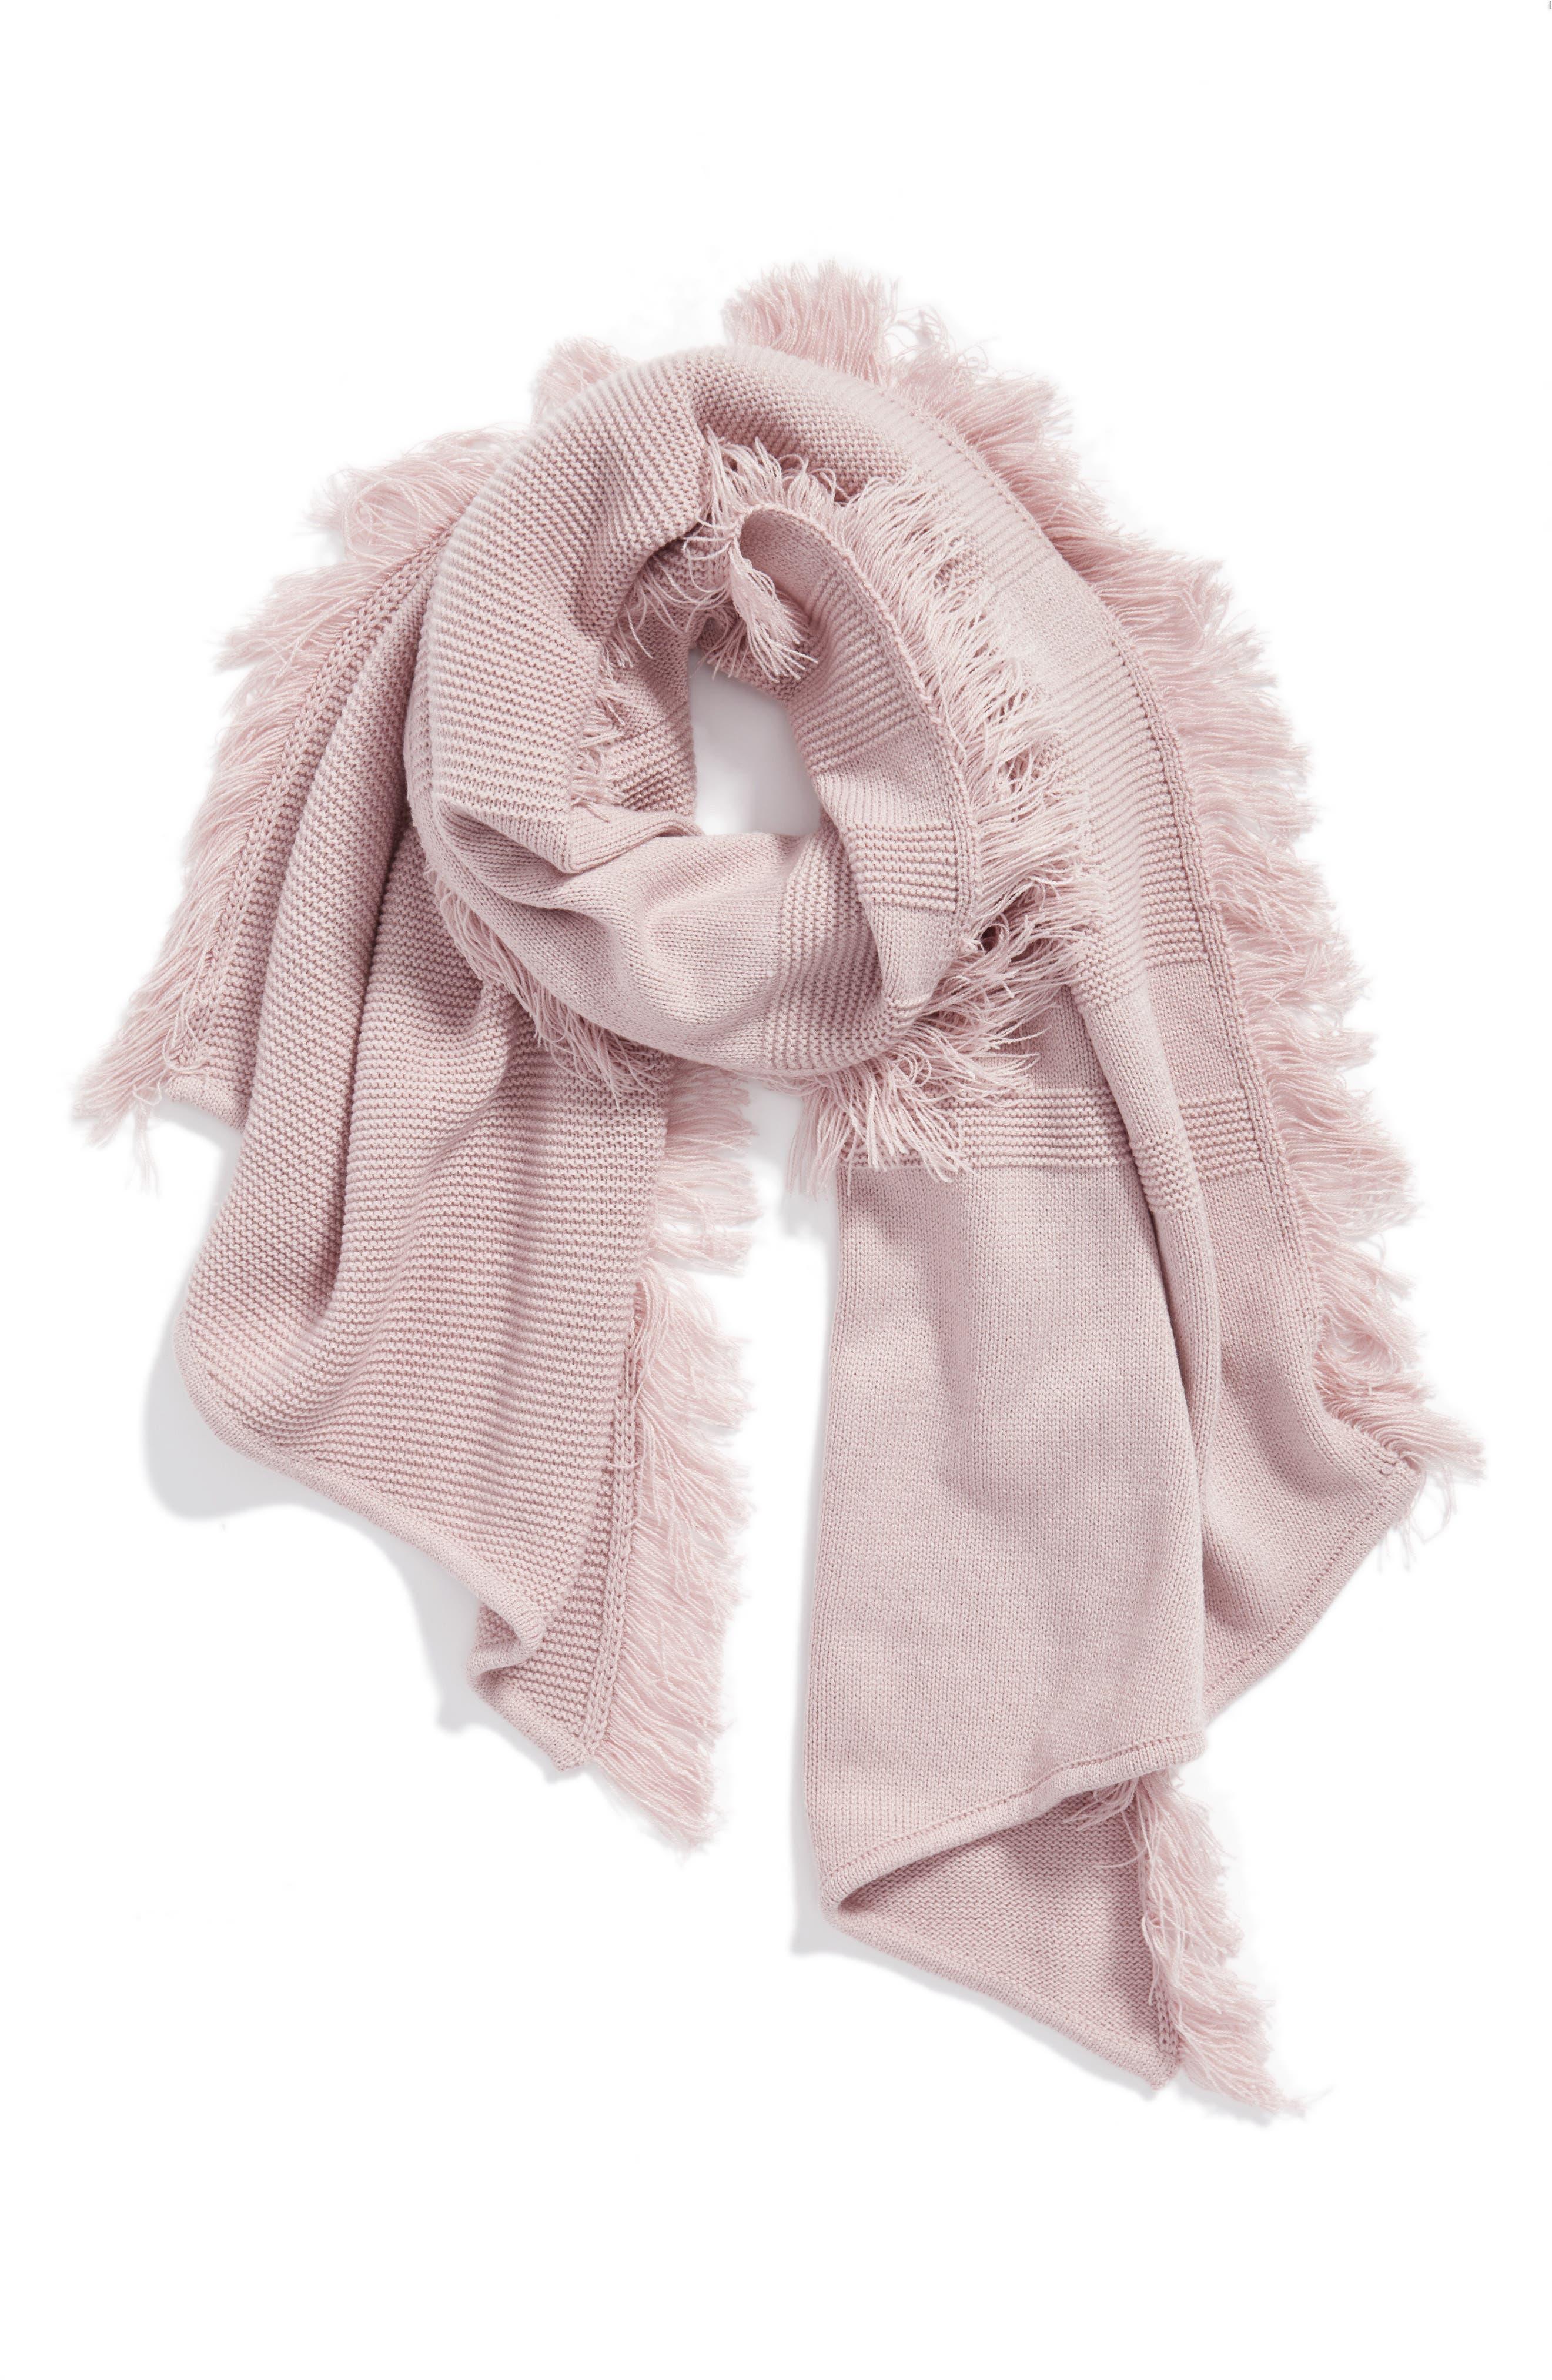 Garter Stripe Stitch Blanket Scarf,                             Main thumbnail 1, color,                             Pale Pink